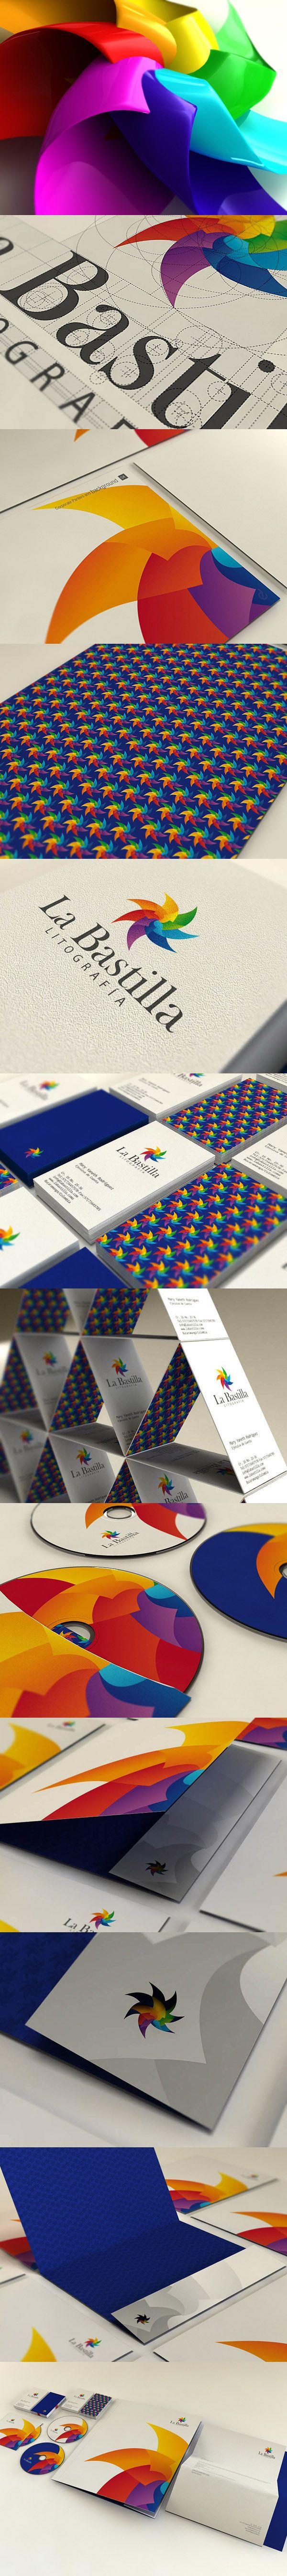 Logo and Identity La bastilla, branding, logo